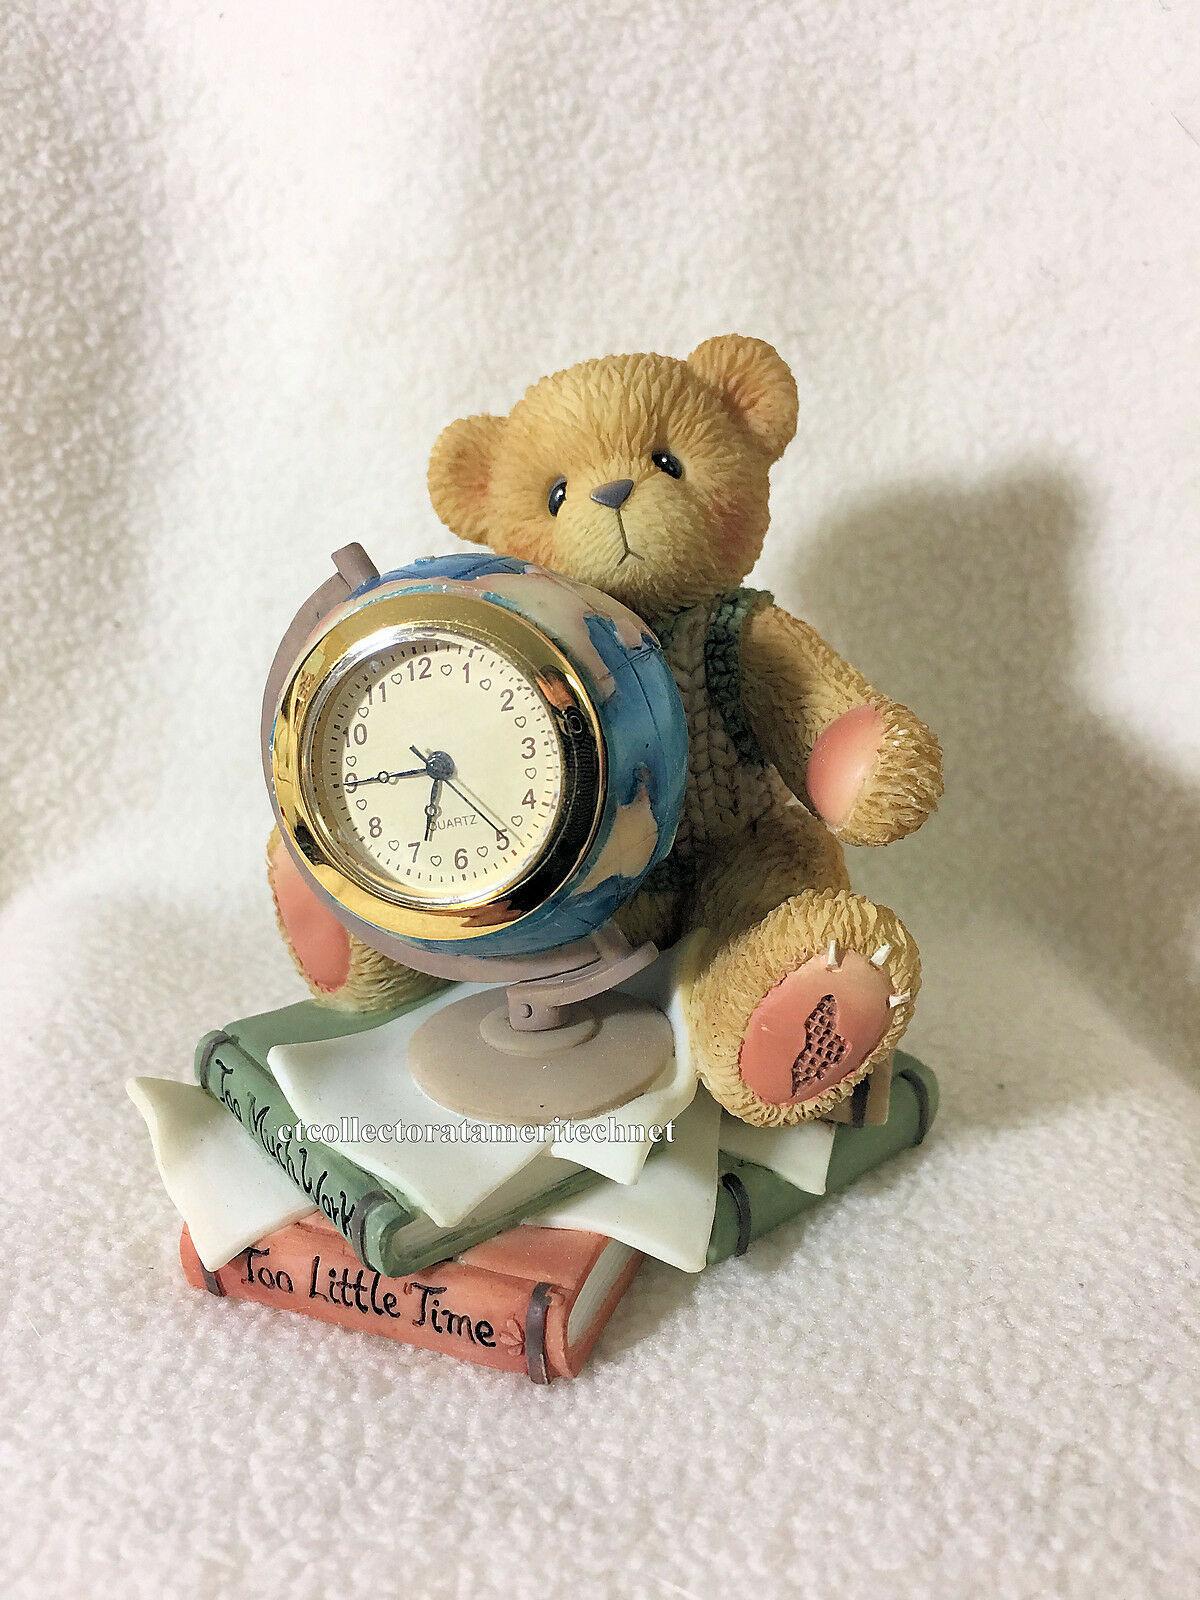 Cherished Teddies Clock Too Much Work Too Little Time  2001 NIB - $38.56